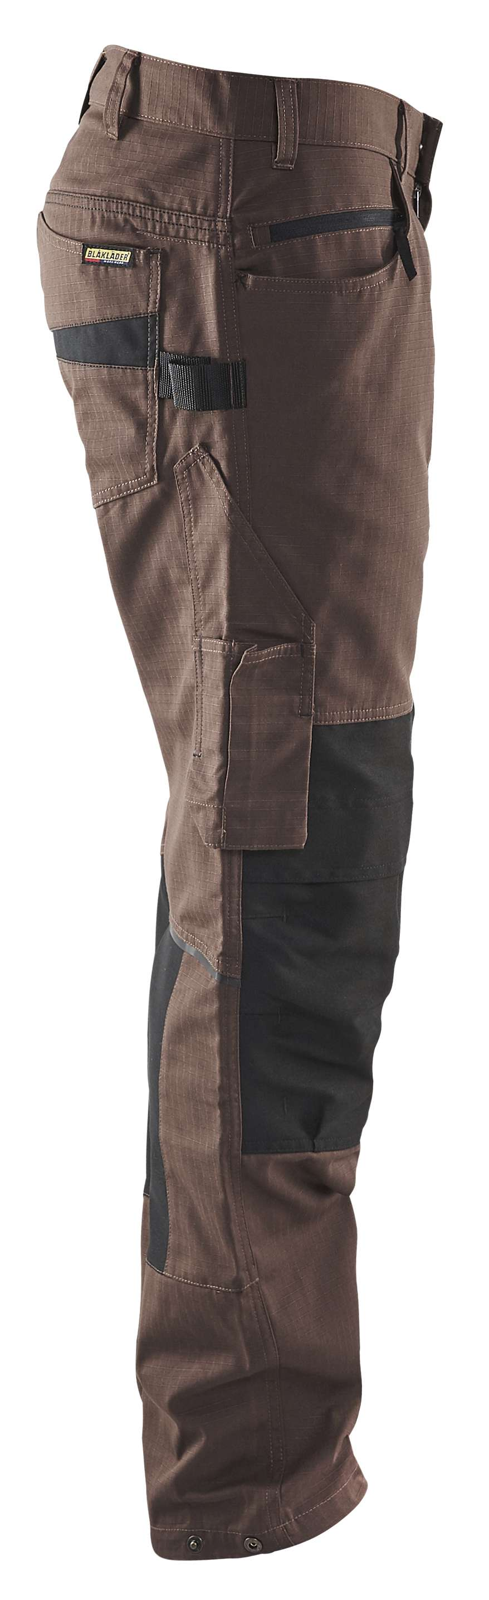 Blaklader Werkbroeken 14951330 met Stretch bruin-zwart(7899)